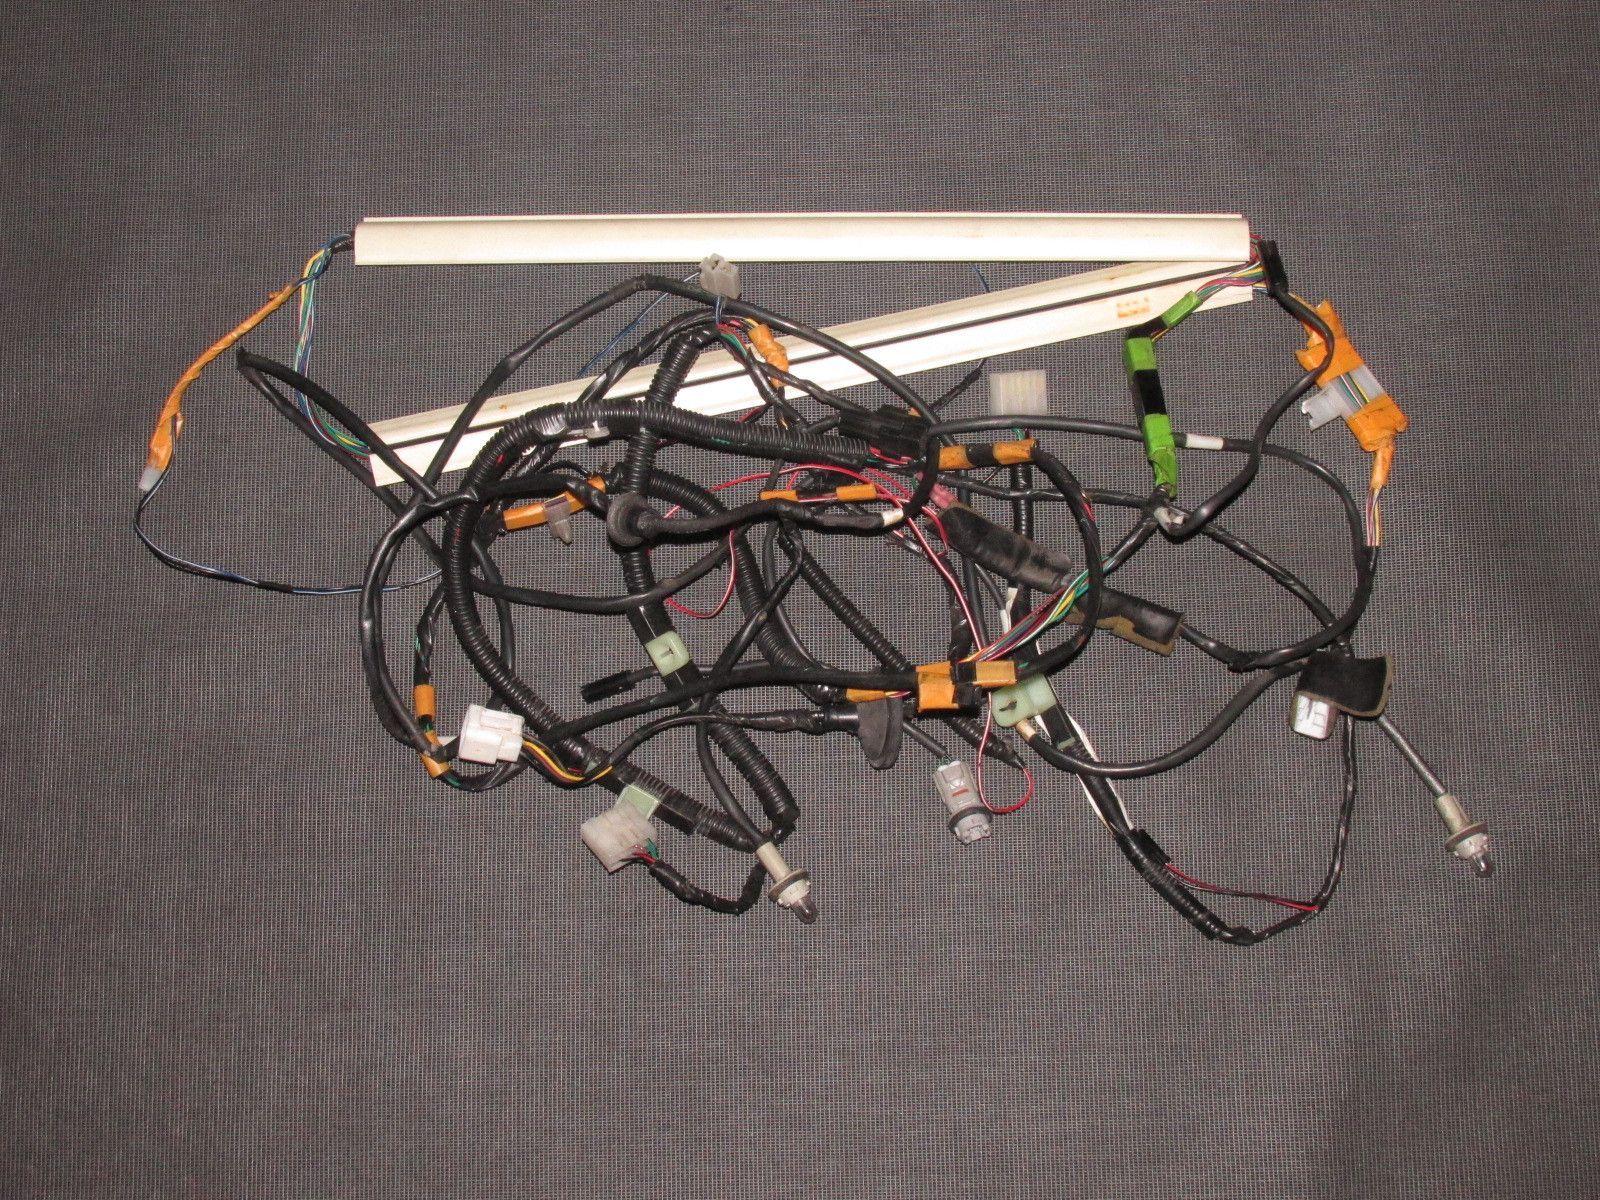 90 91 92 93 Mazda Miata Oem Trunk Wiring Harness Autopartonecom